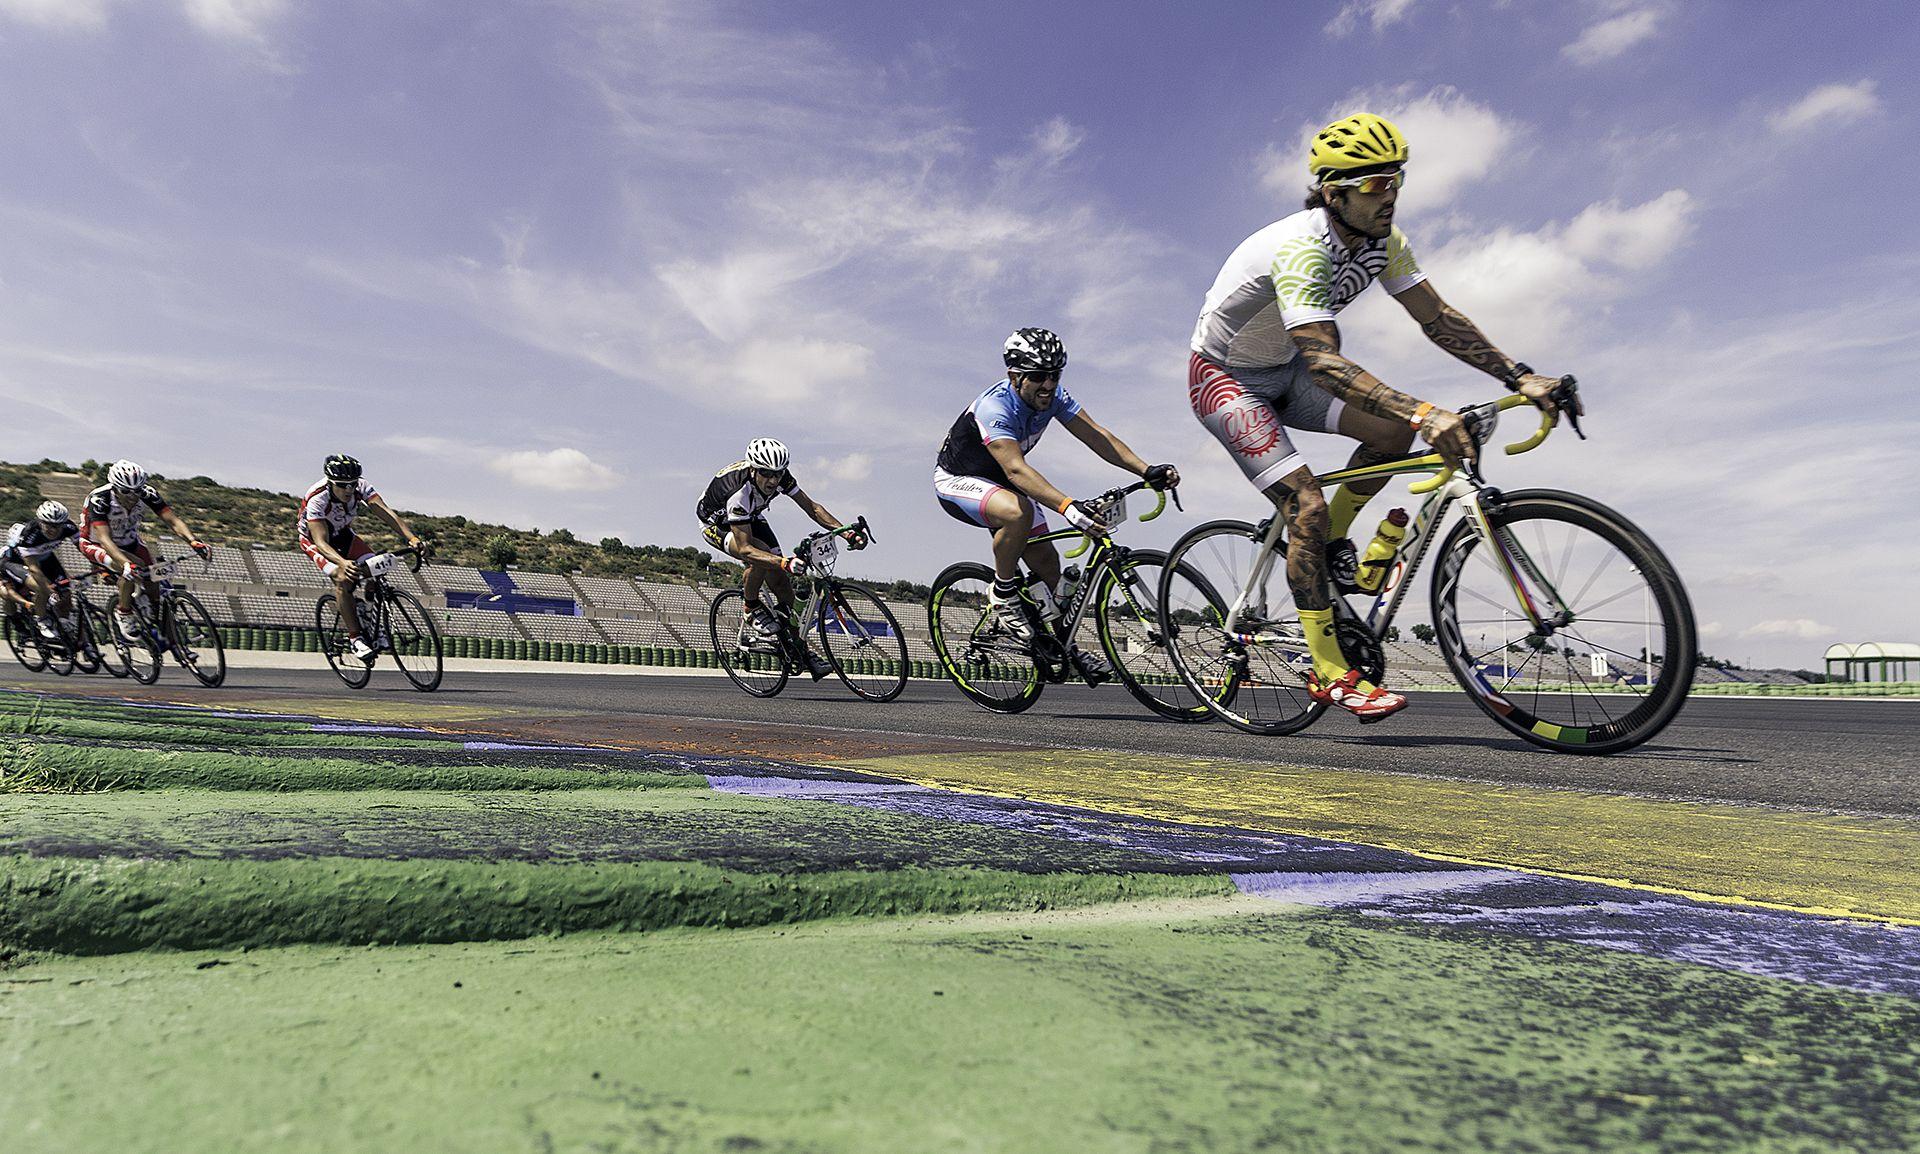 Circuito Cheste : Campeonato ciclismo horas en el circuito de cheste cycling